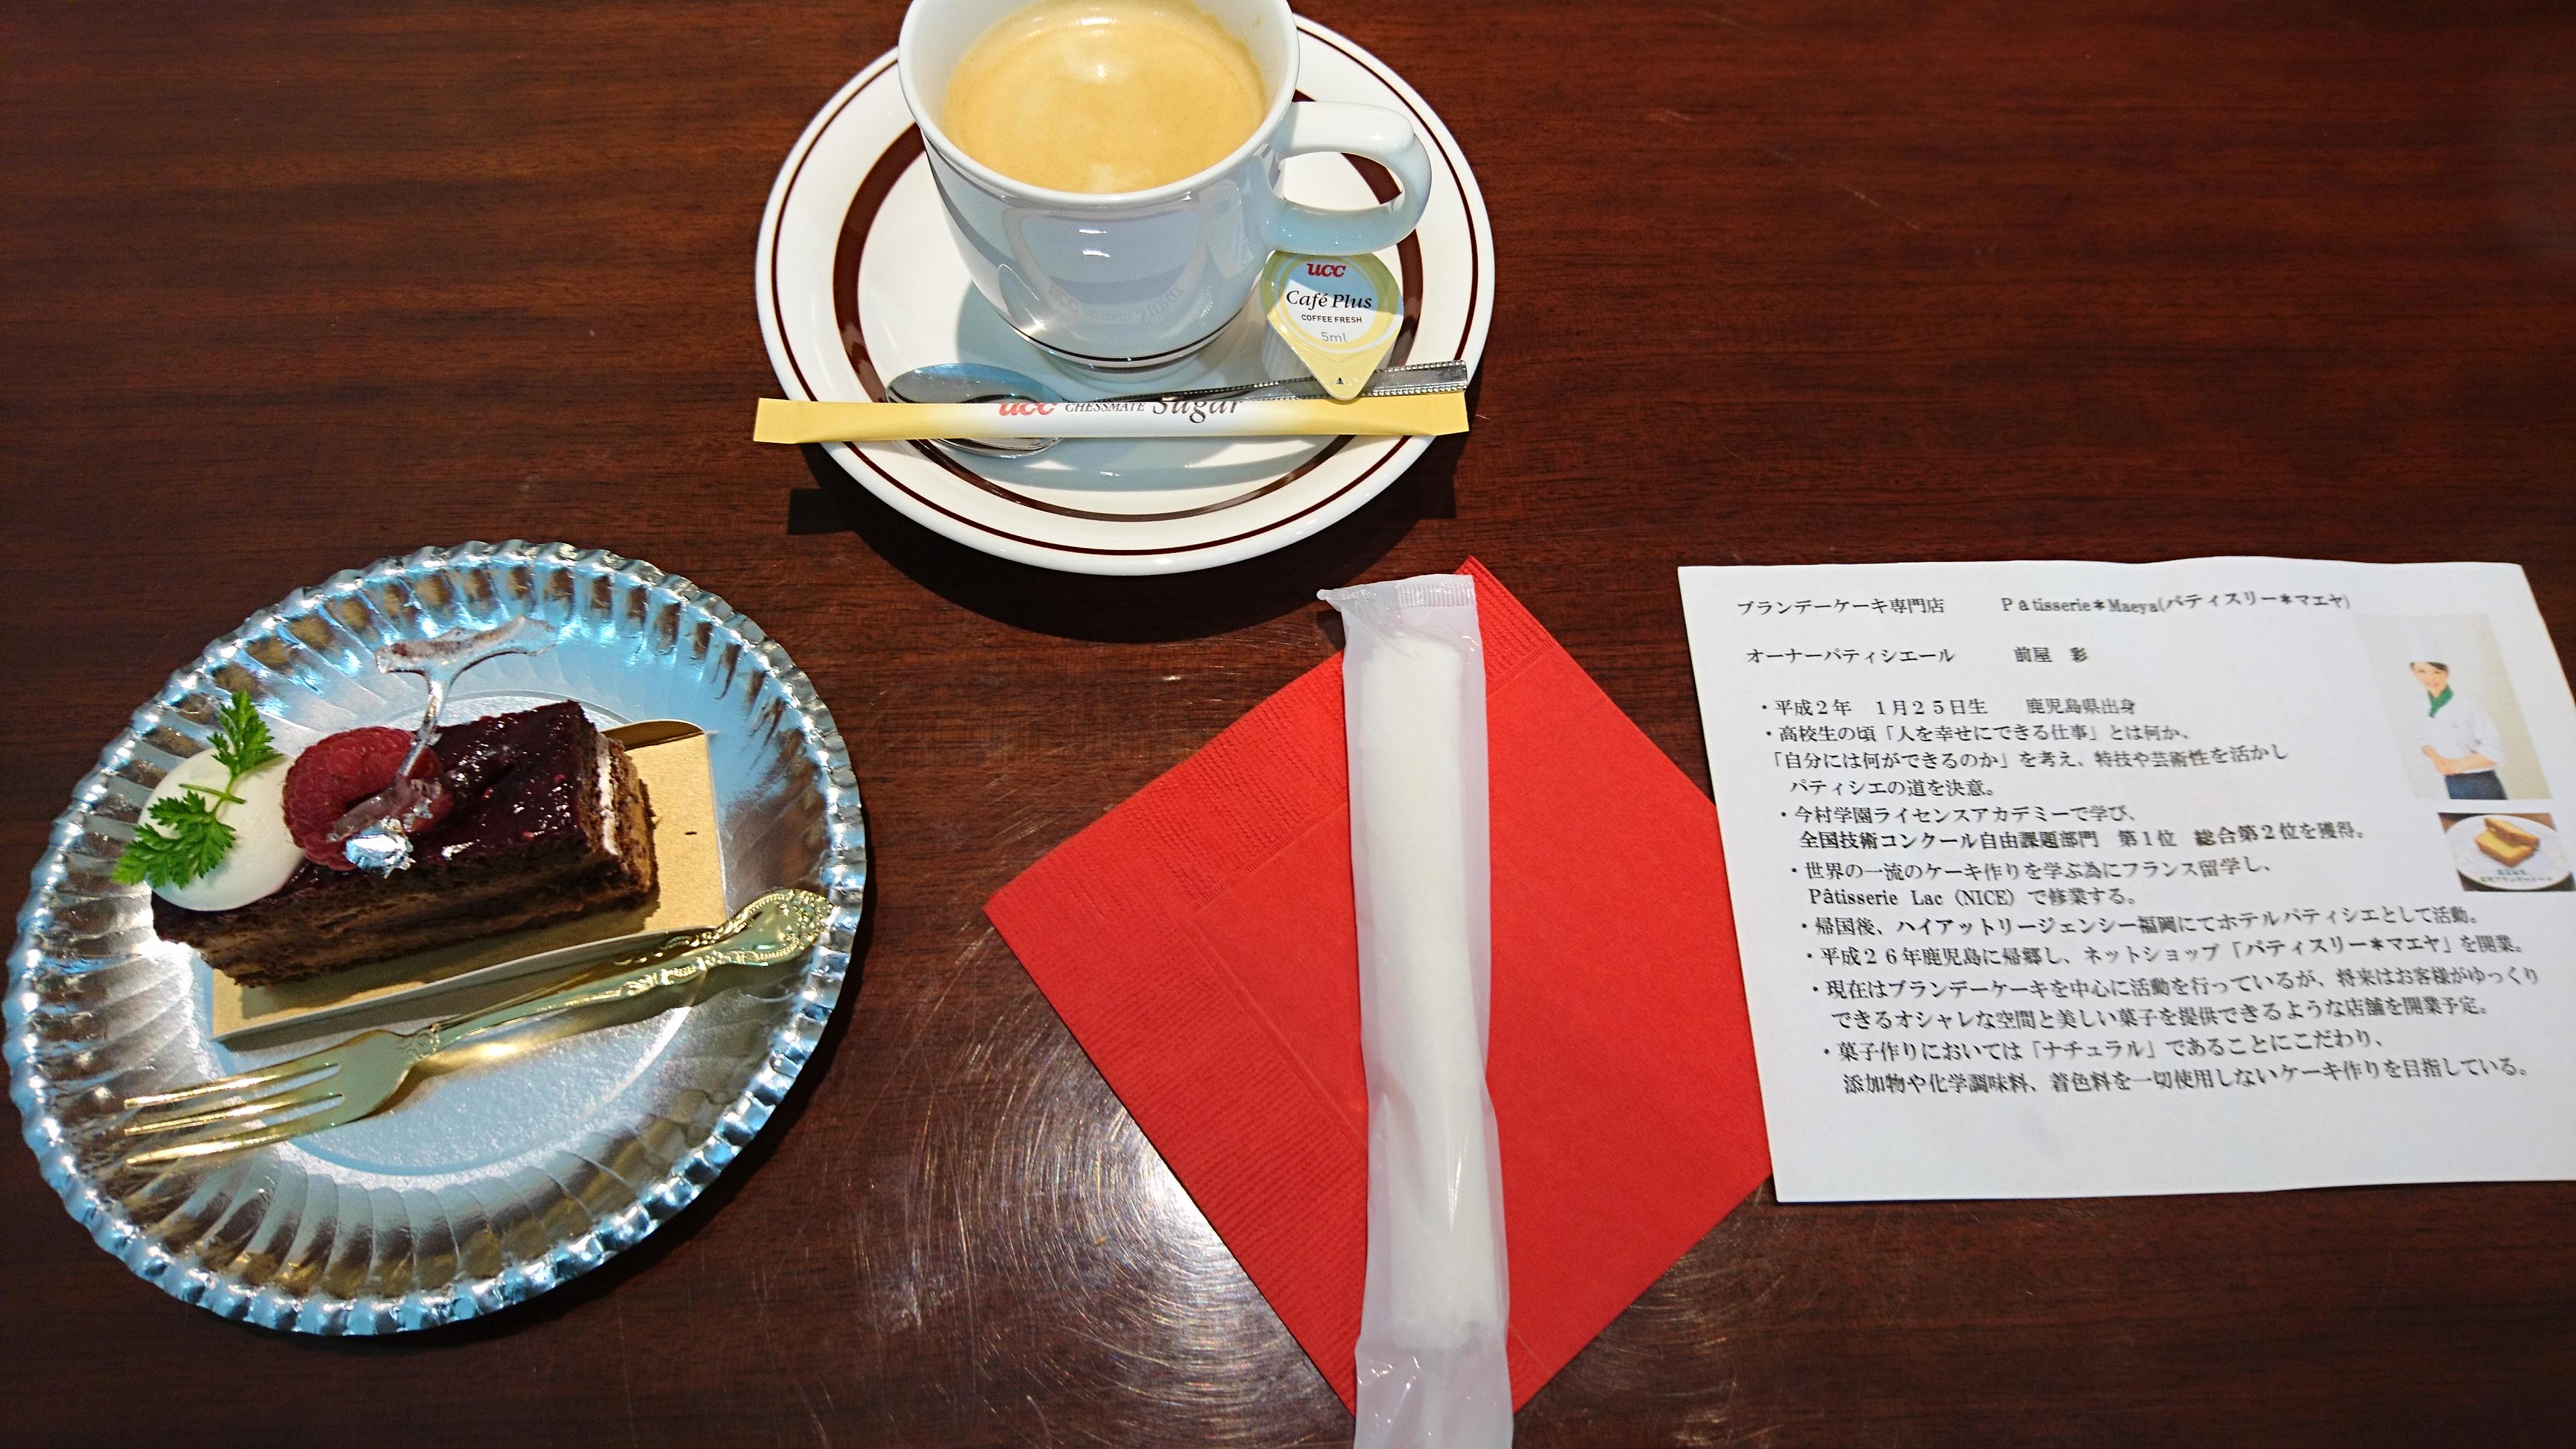 http://hashiguchi-seikotu.com/blog/about/DSC_0290.JPG